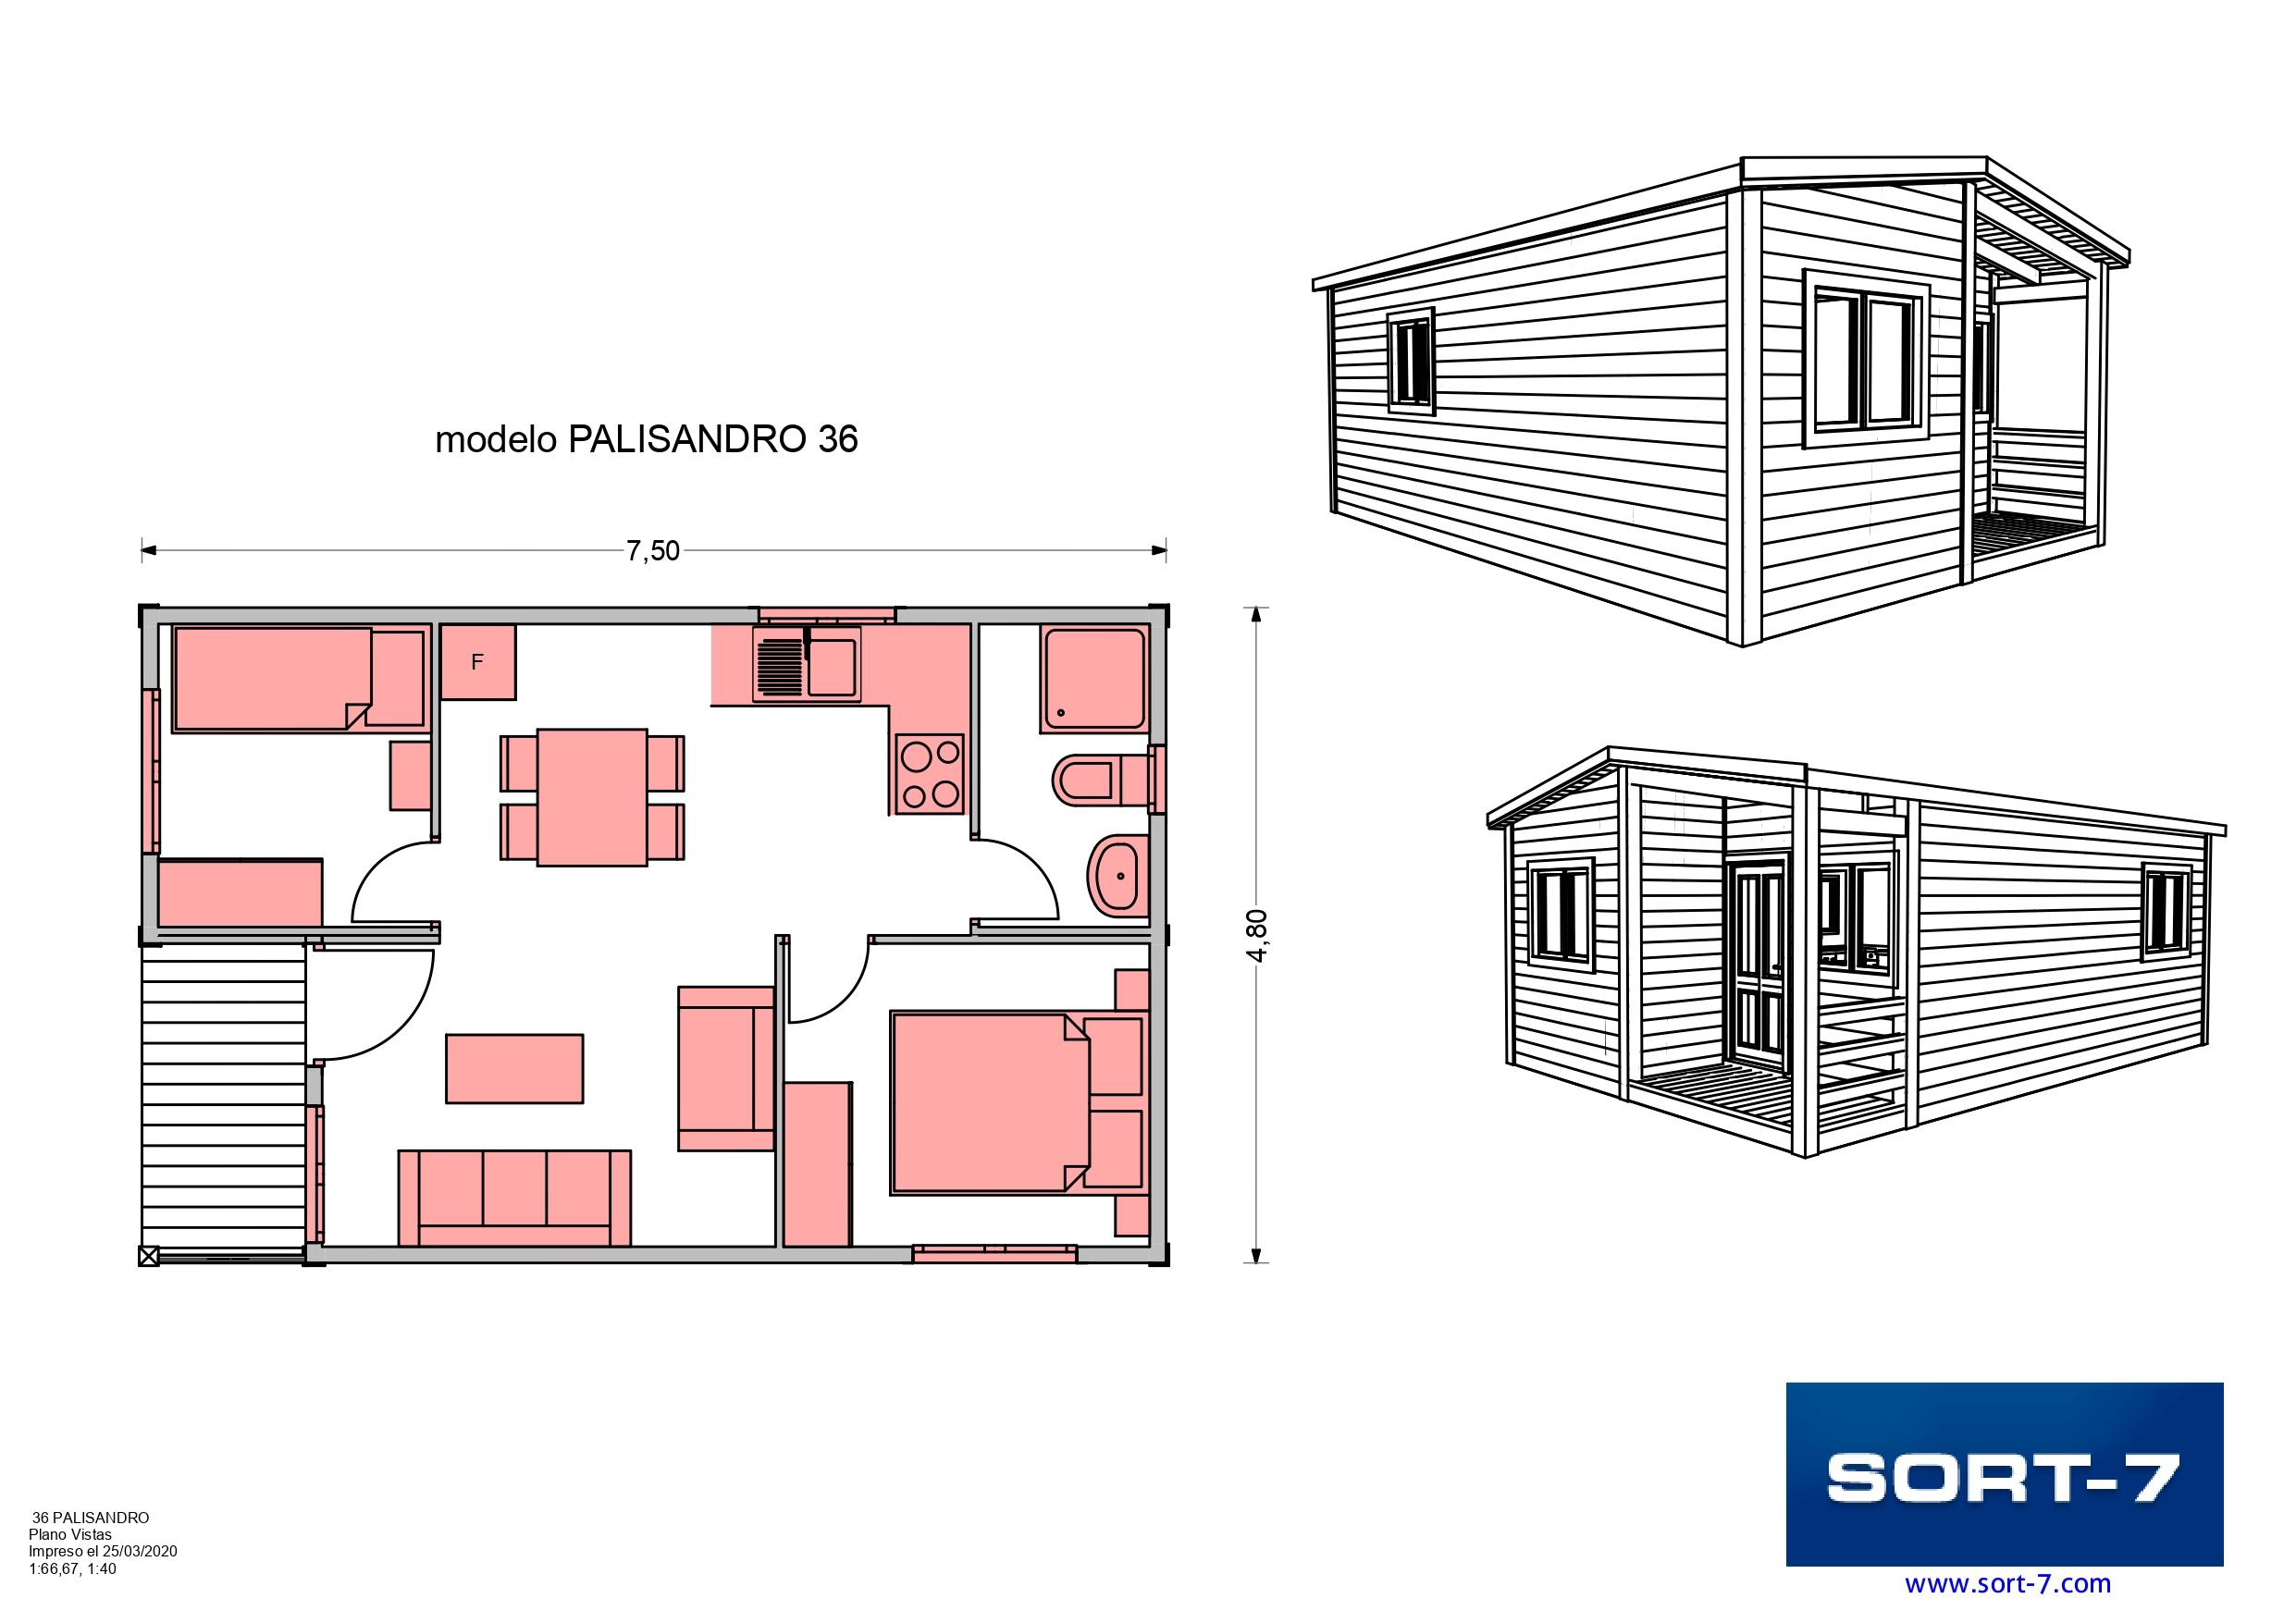 Solicitar presupuesto: Modelo 36m² Palisandro - 4fe27-36-PALISANDRO-vista5_page-0001.jpg